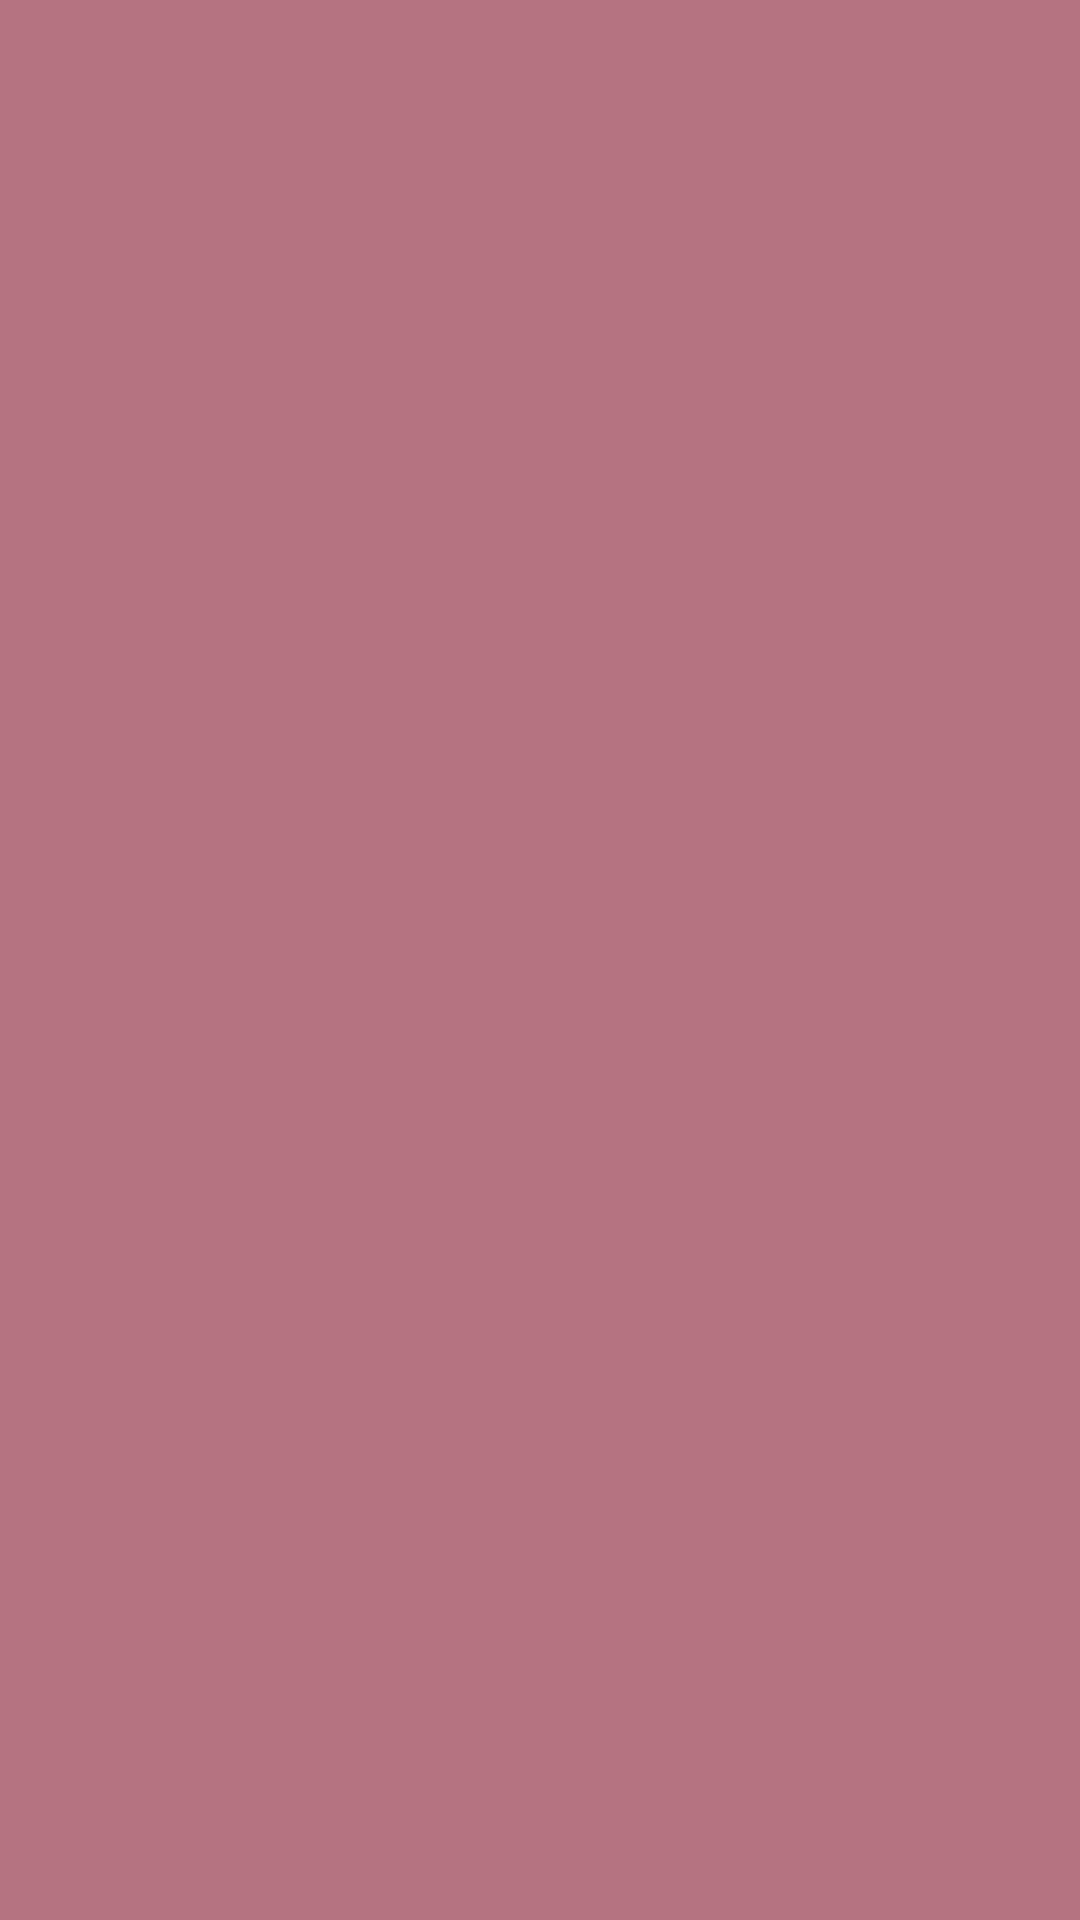 1080x1920 Turkish Rose Solid Color Background